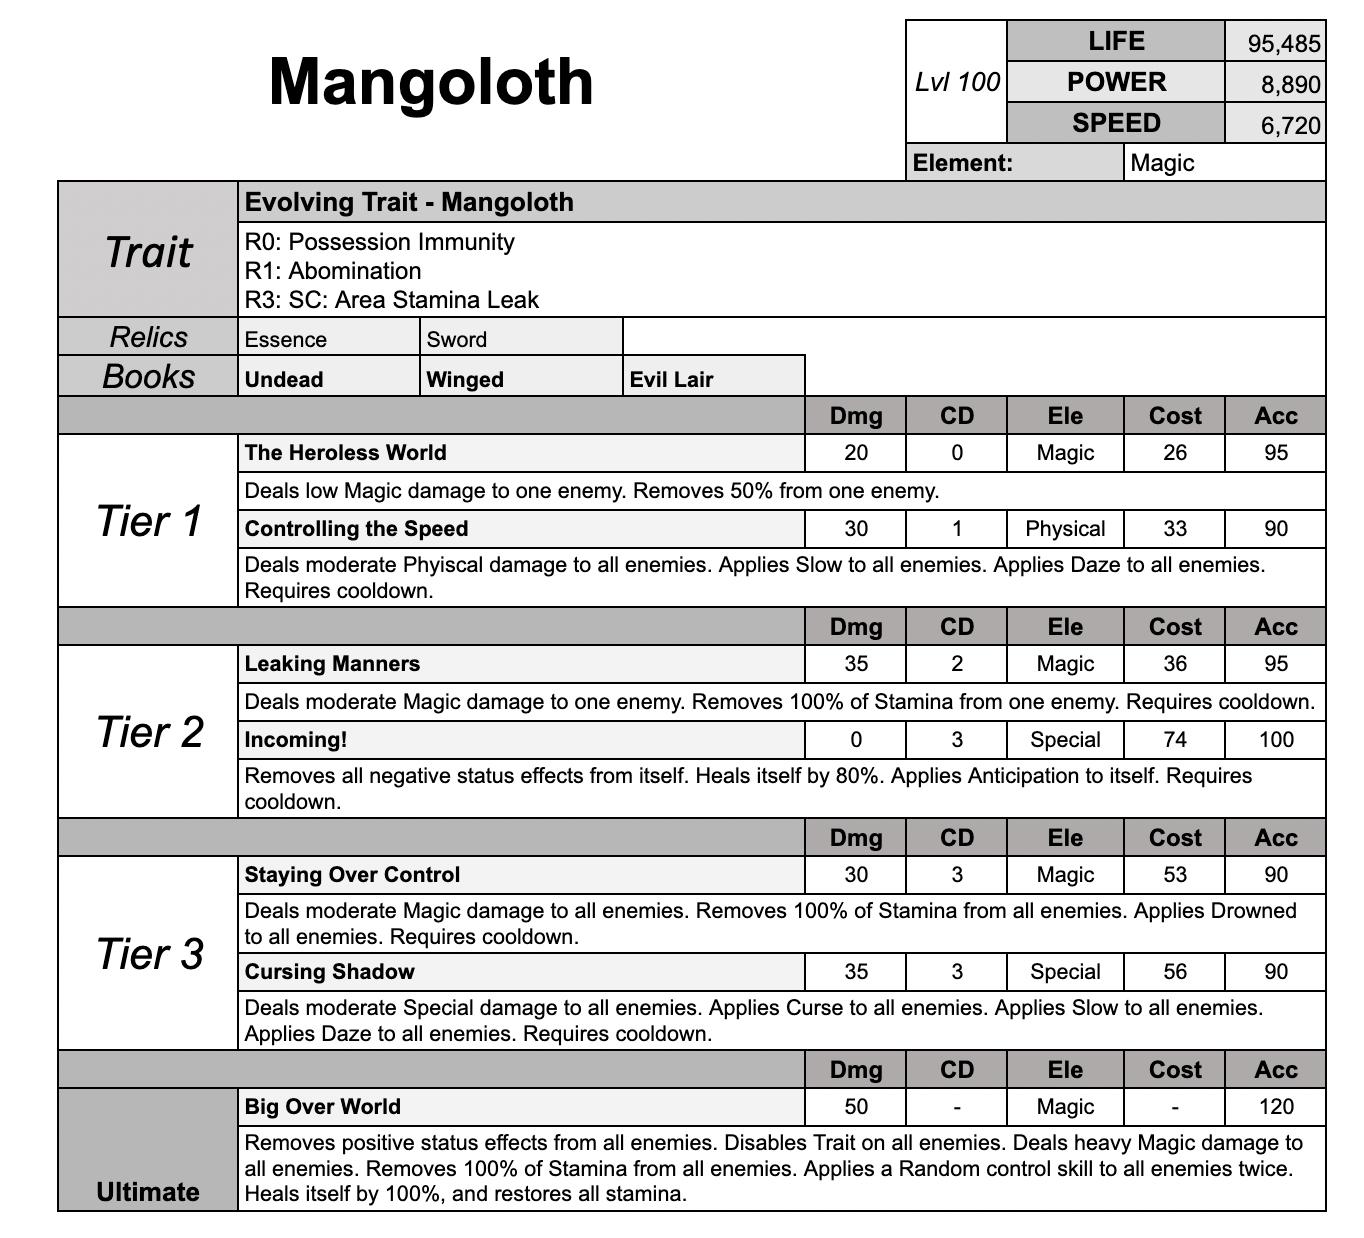 0_1626097516074_2. Mangoloth.png